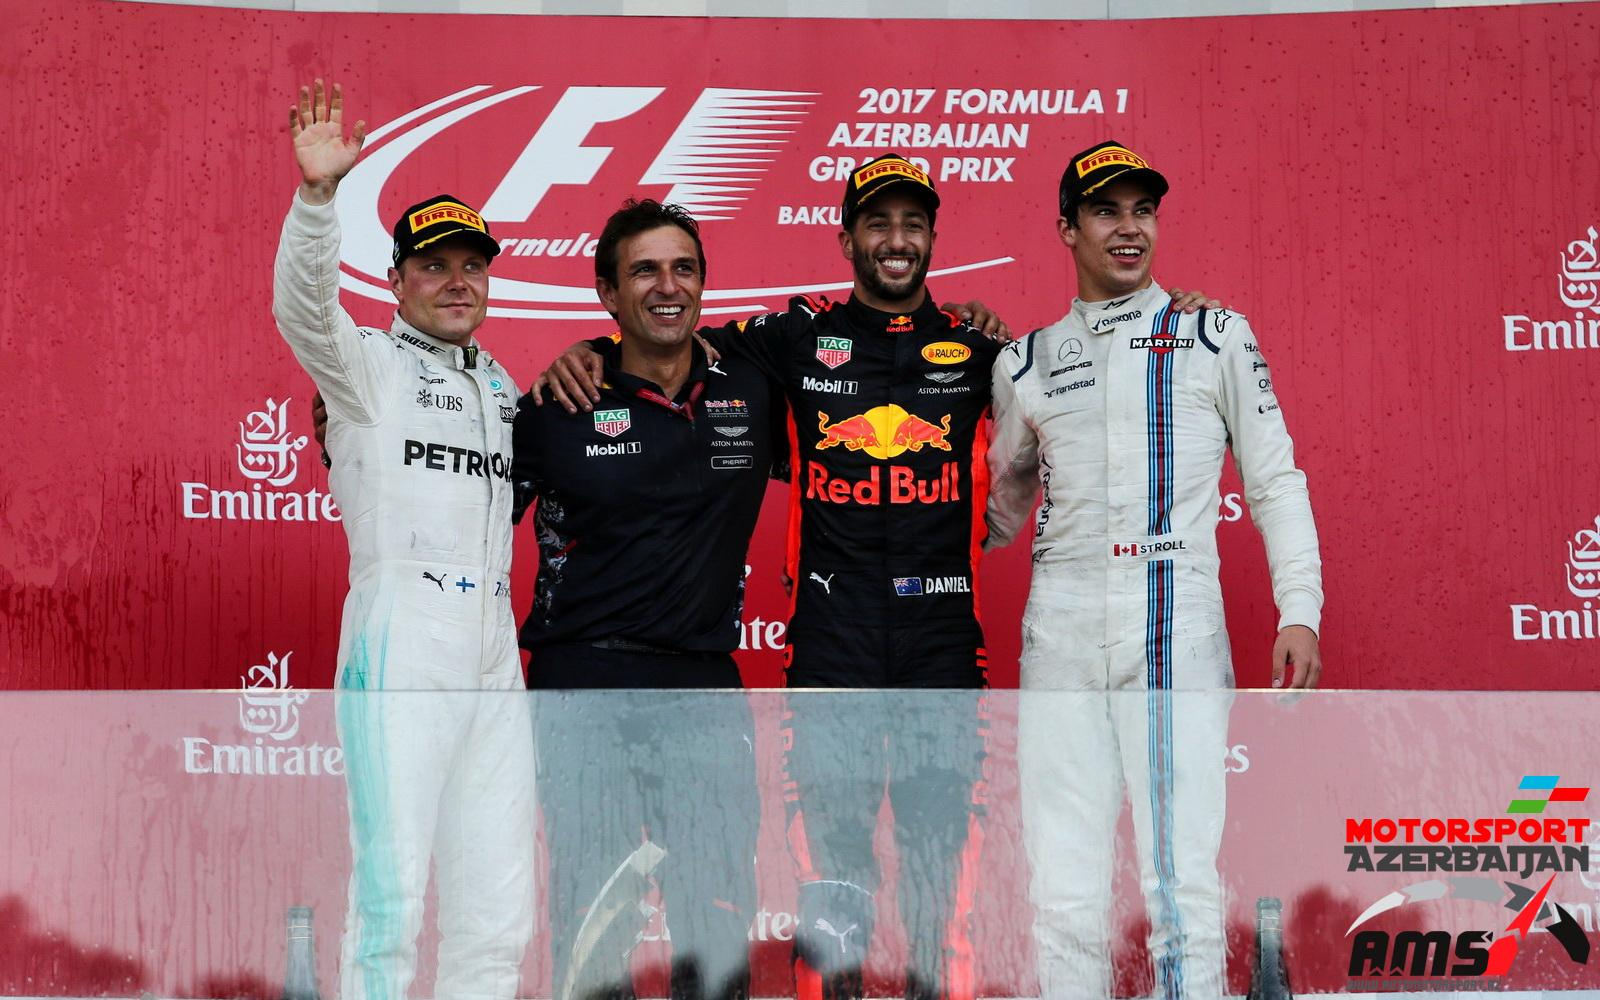 Valtteri Bottas, Daniel Ricciardo, Lance Stroll, Baku City Circuit, 2017